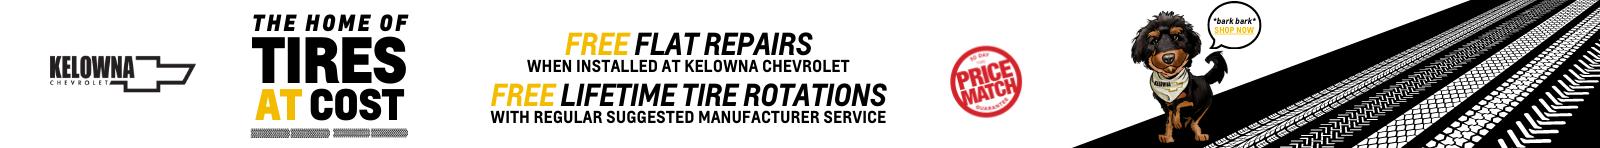 Copy of Tires at Cost – KLC – 1200 x 200 (2)